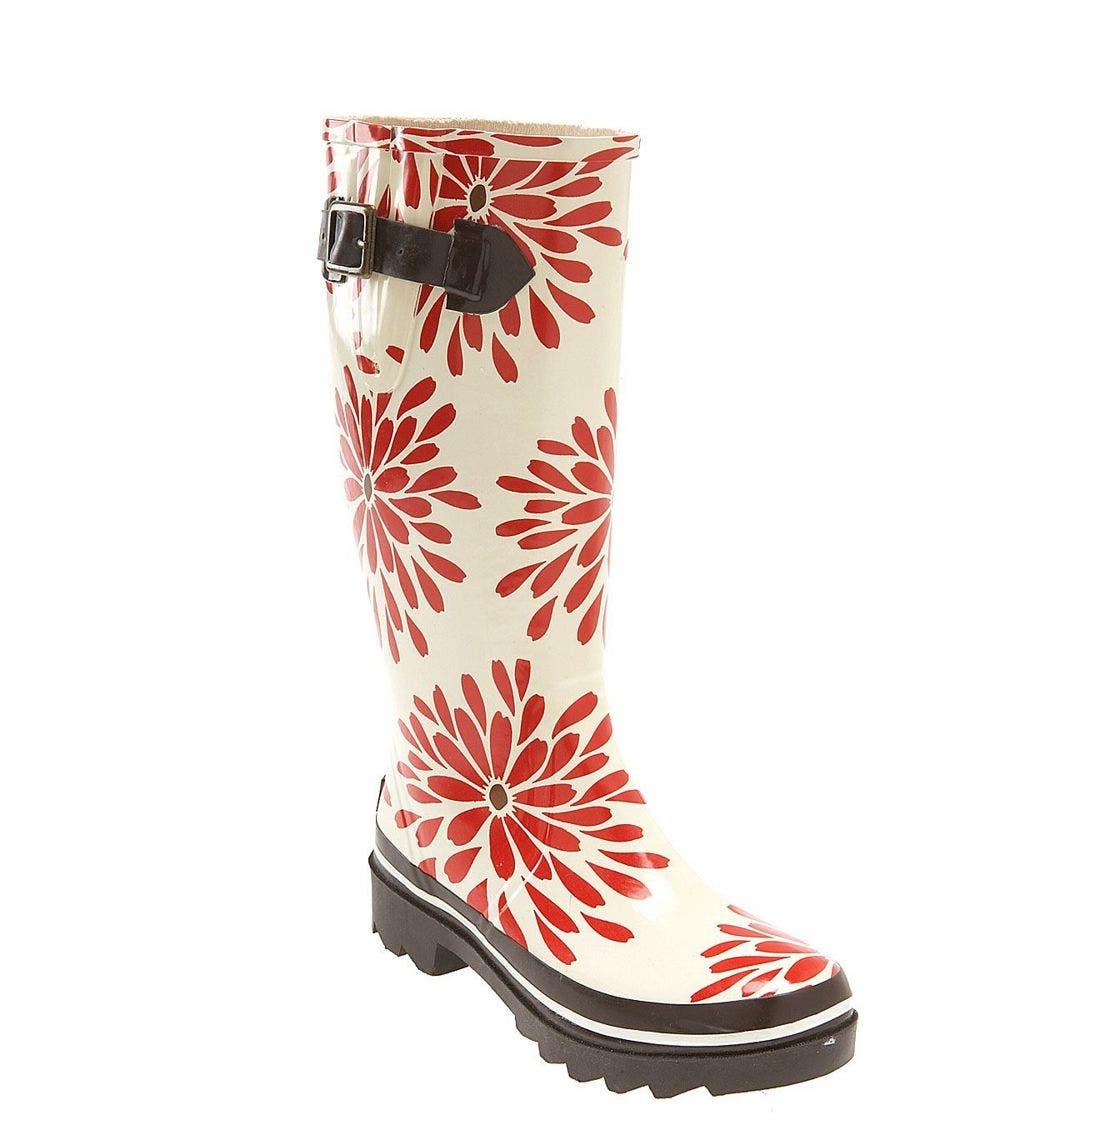 Main Image - kate spade 'riley' red daisy rain boot